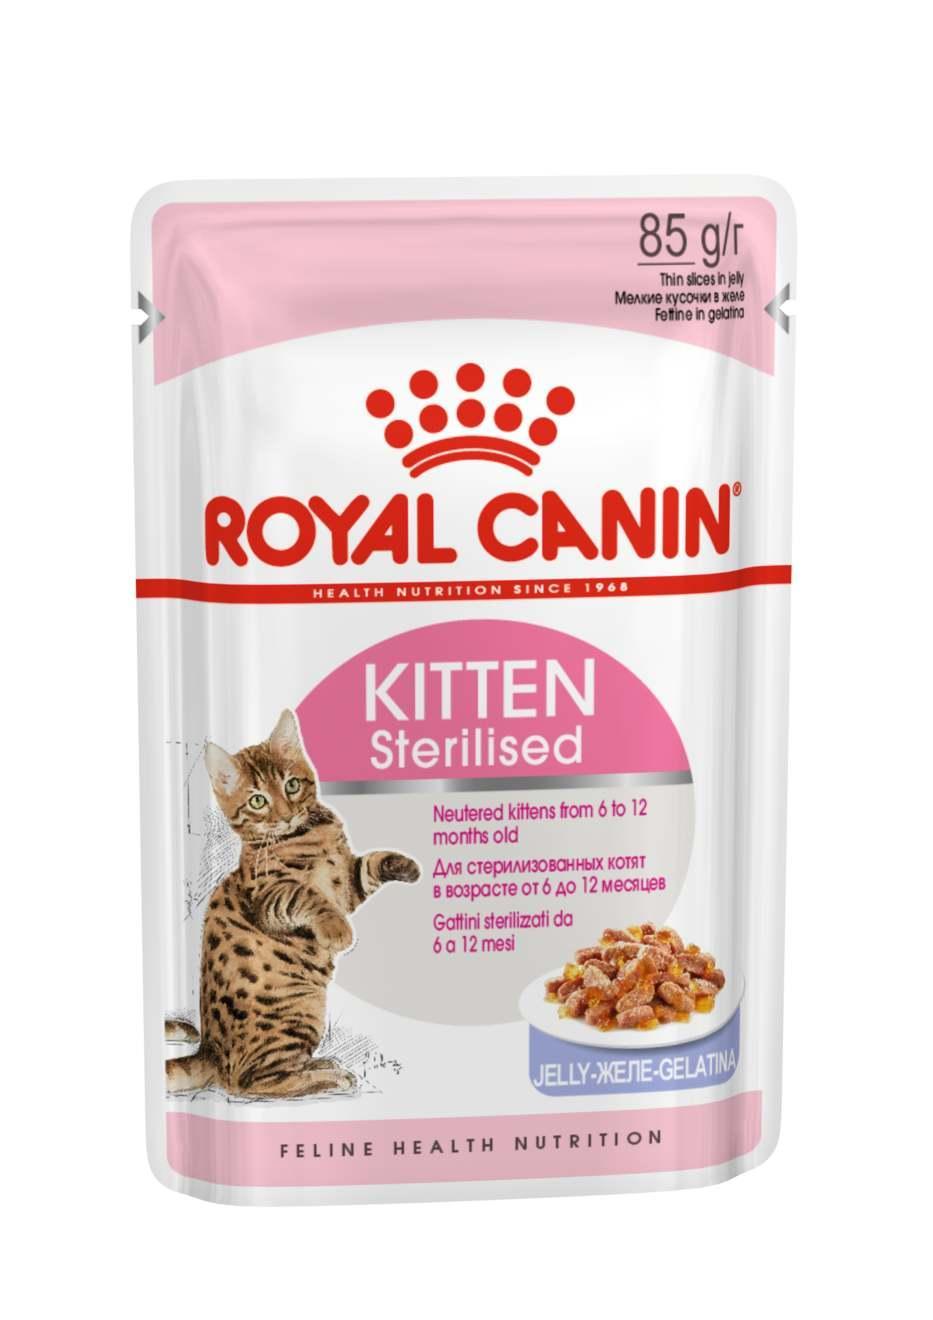 Royal Canin паучи RC Кусочки в желе для котят с момента операции до 12 мес. (Kitten Sterilized) 532502, 0,085 кг, 25464